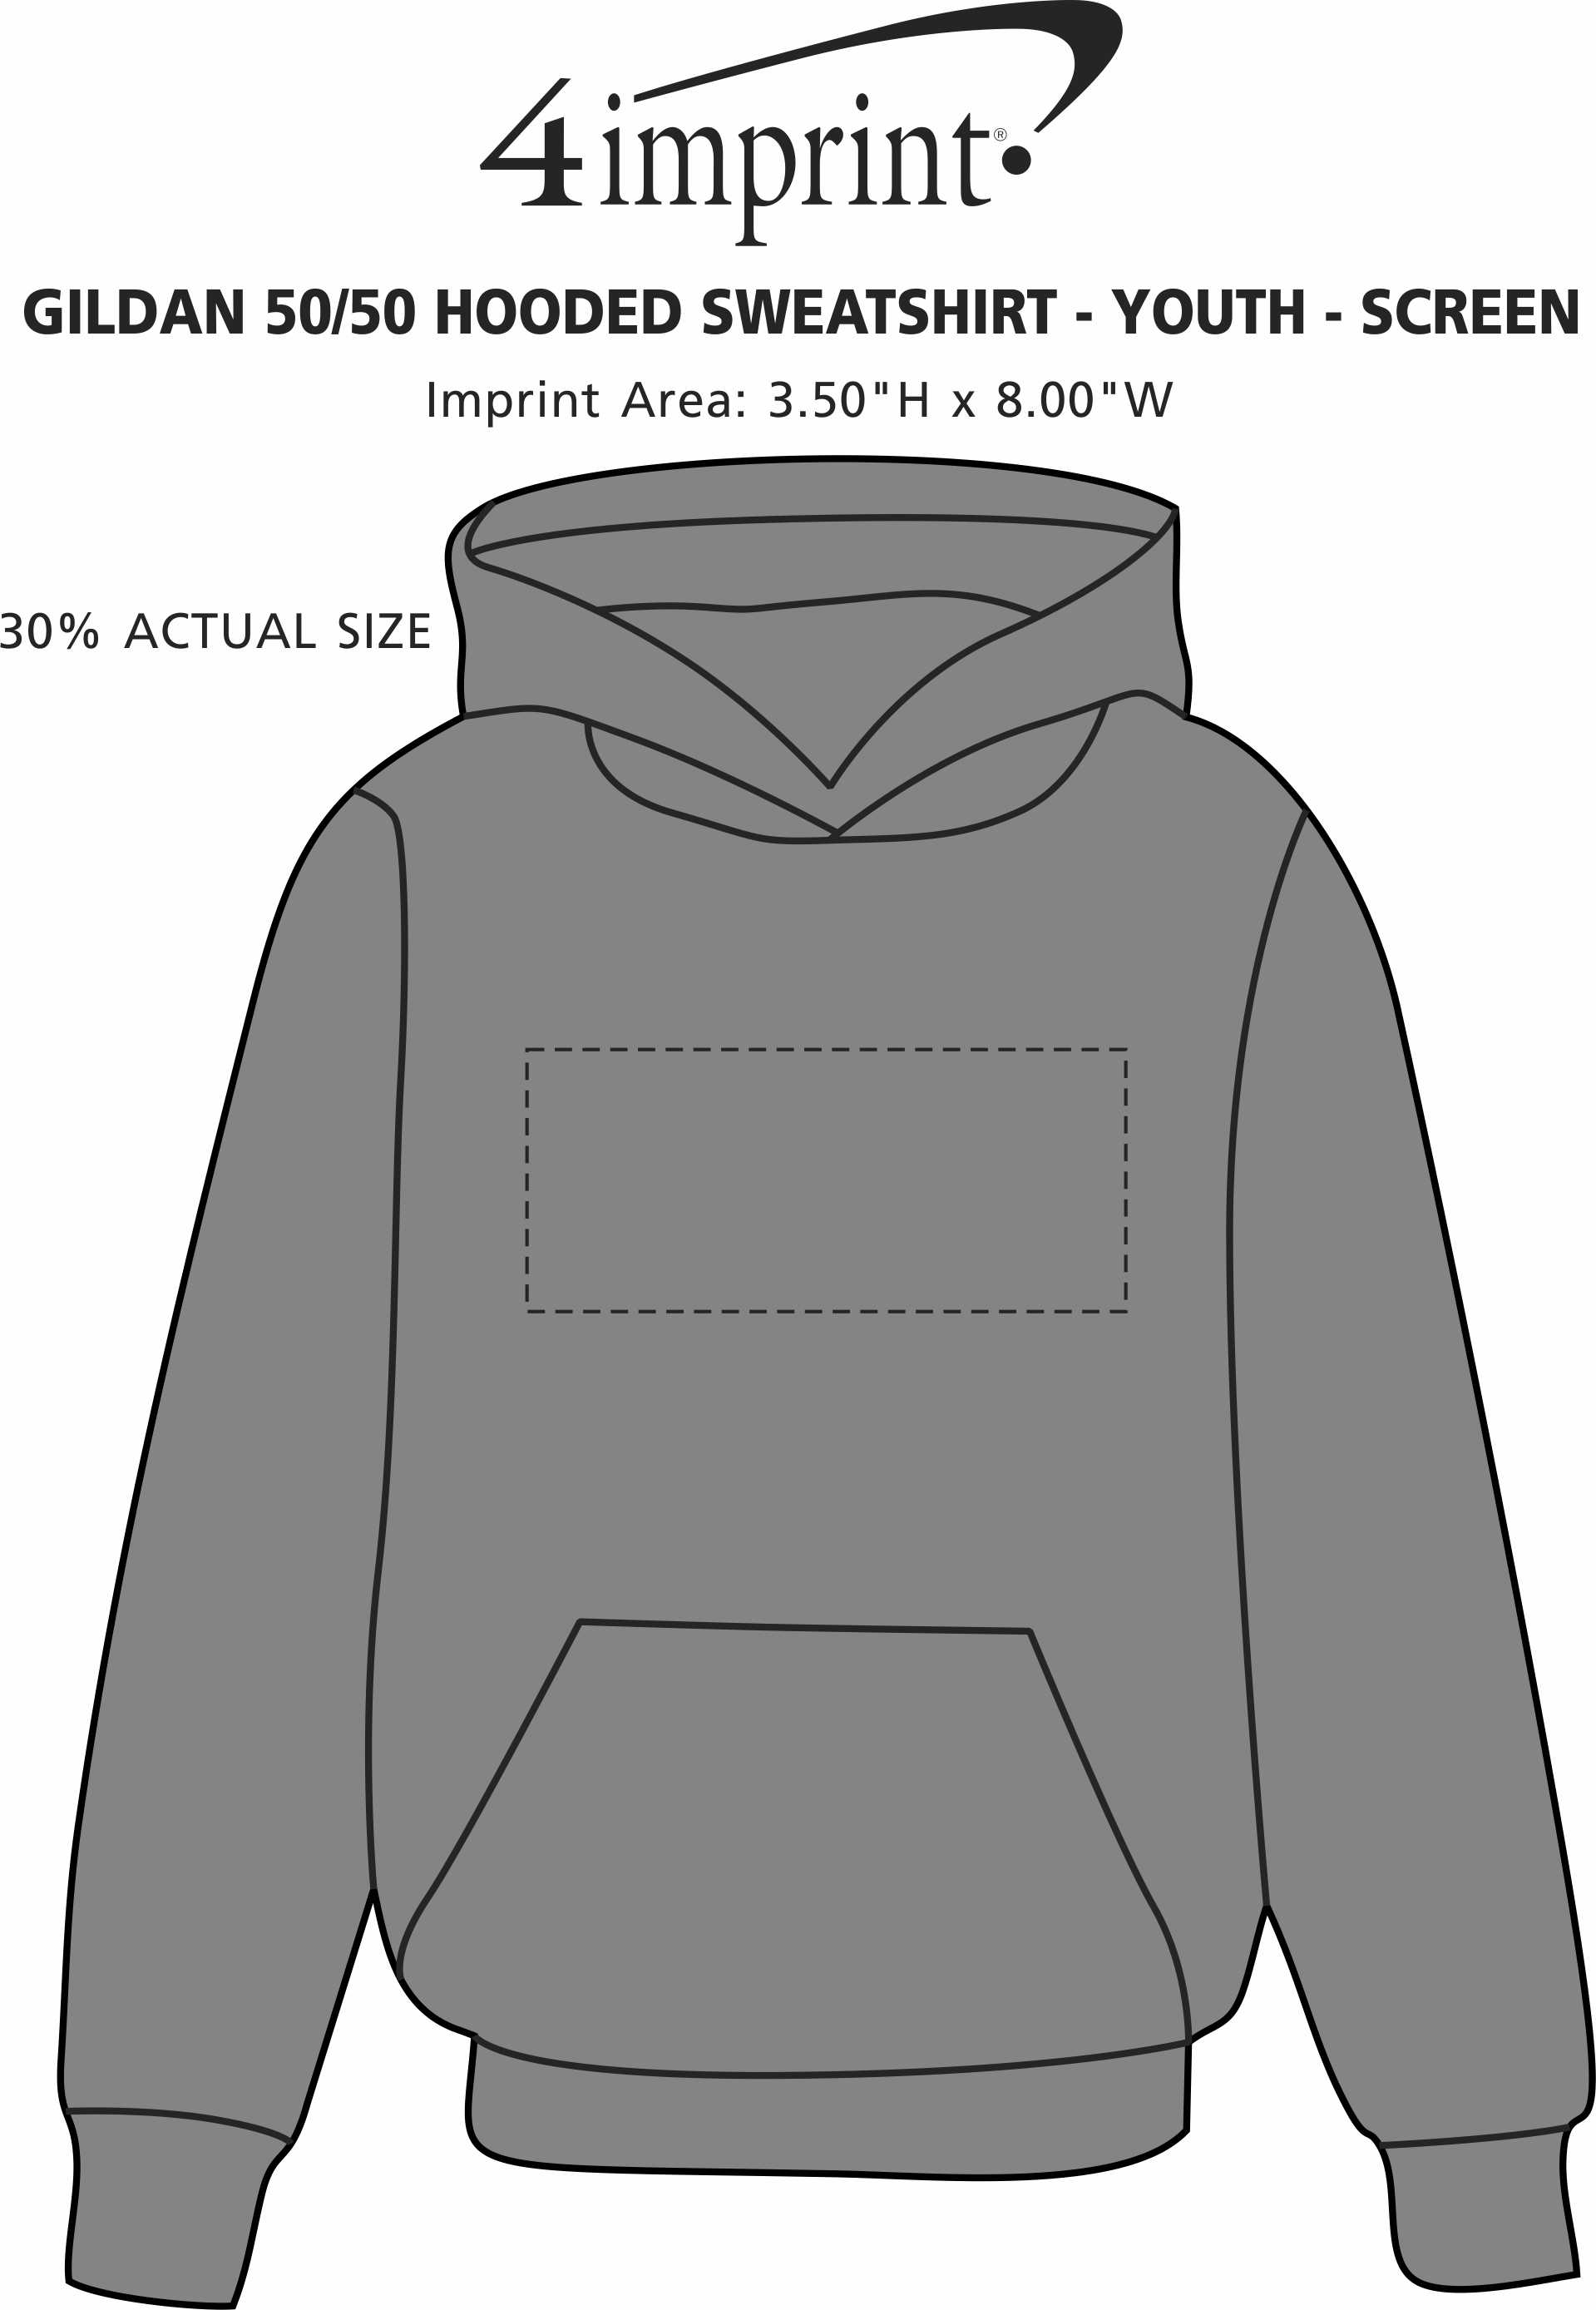 Imprint Area of Gildan 50/50 Hooded Sweatshirt - Youth - Screen